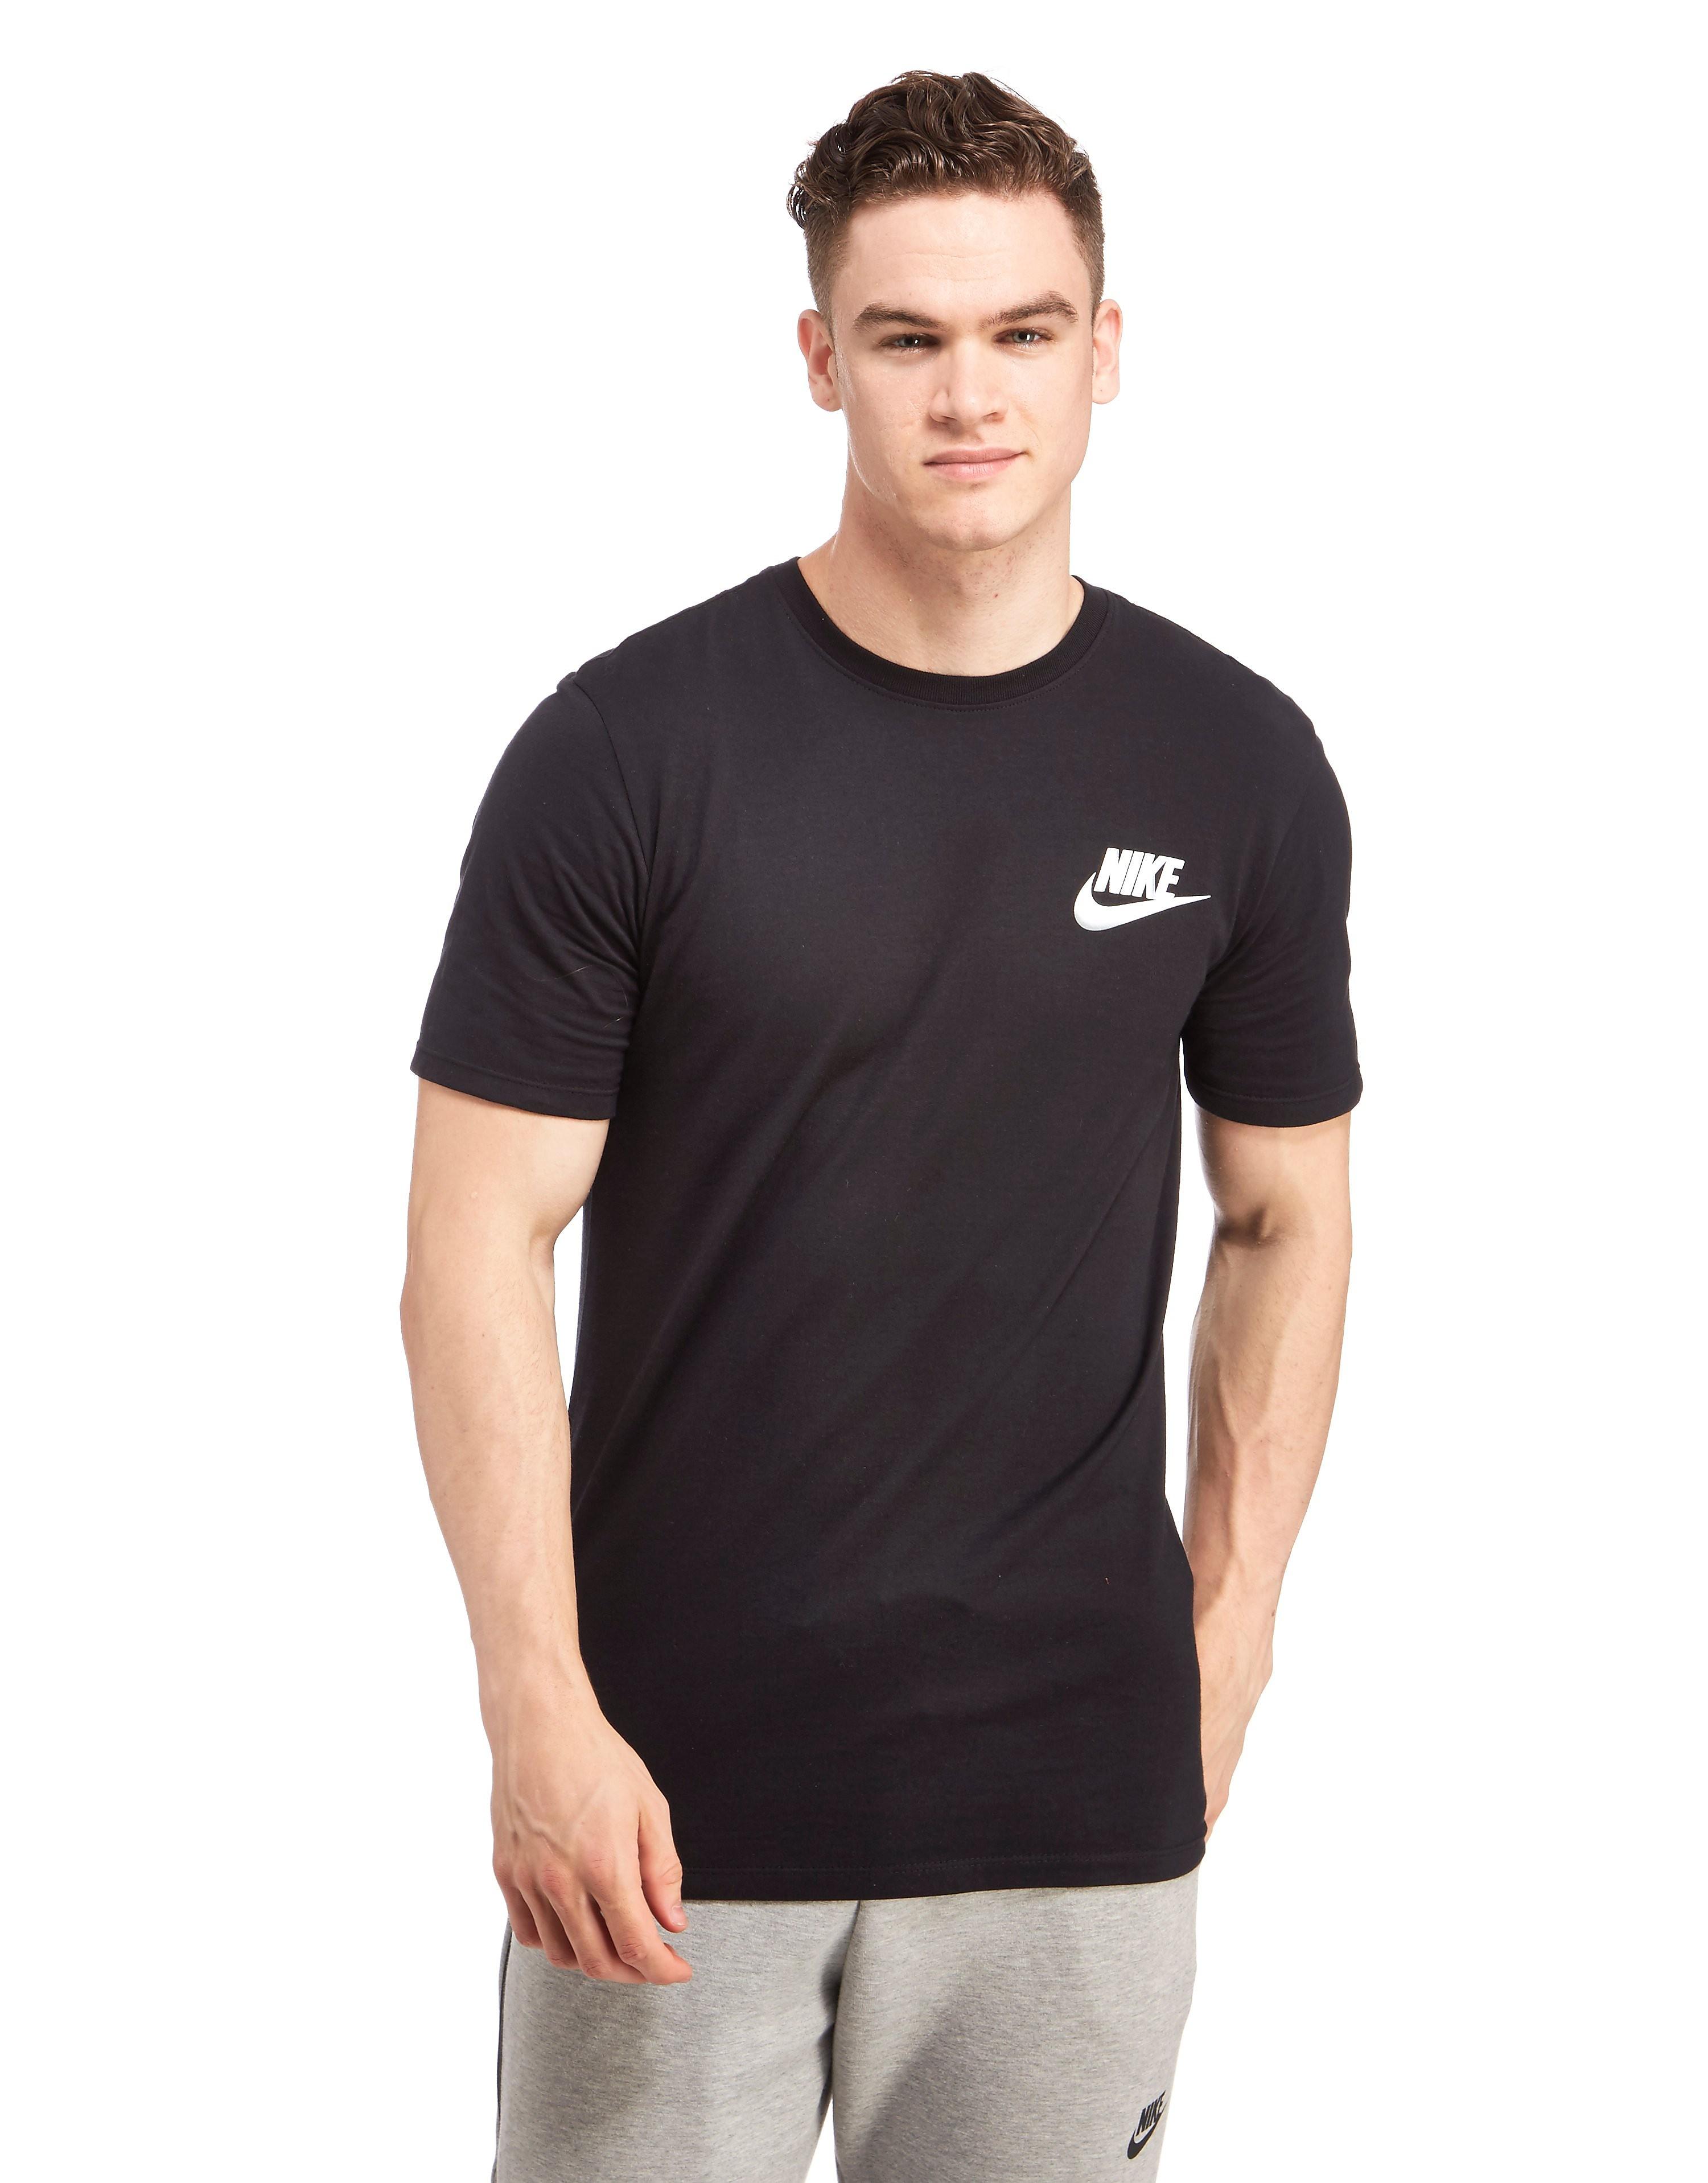 Nike Scribbler T-Shirt